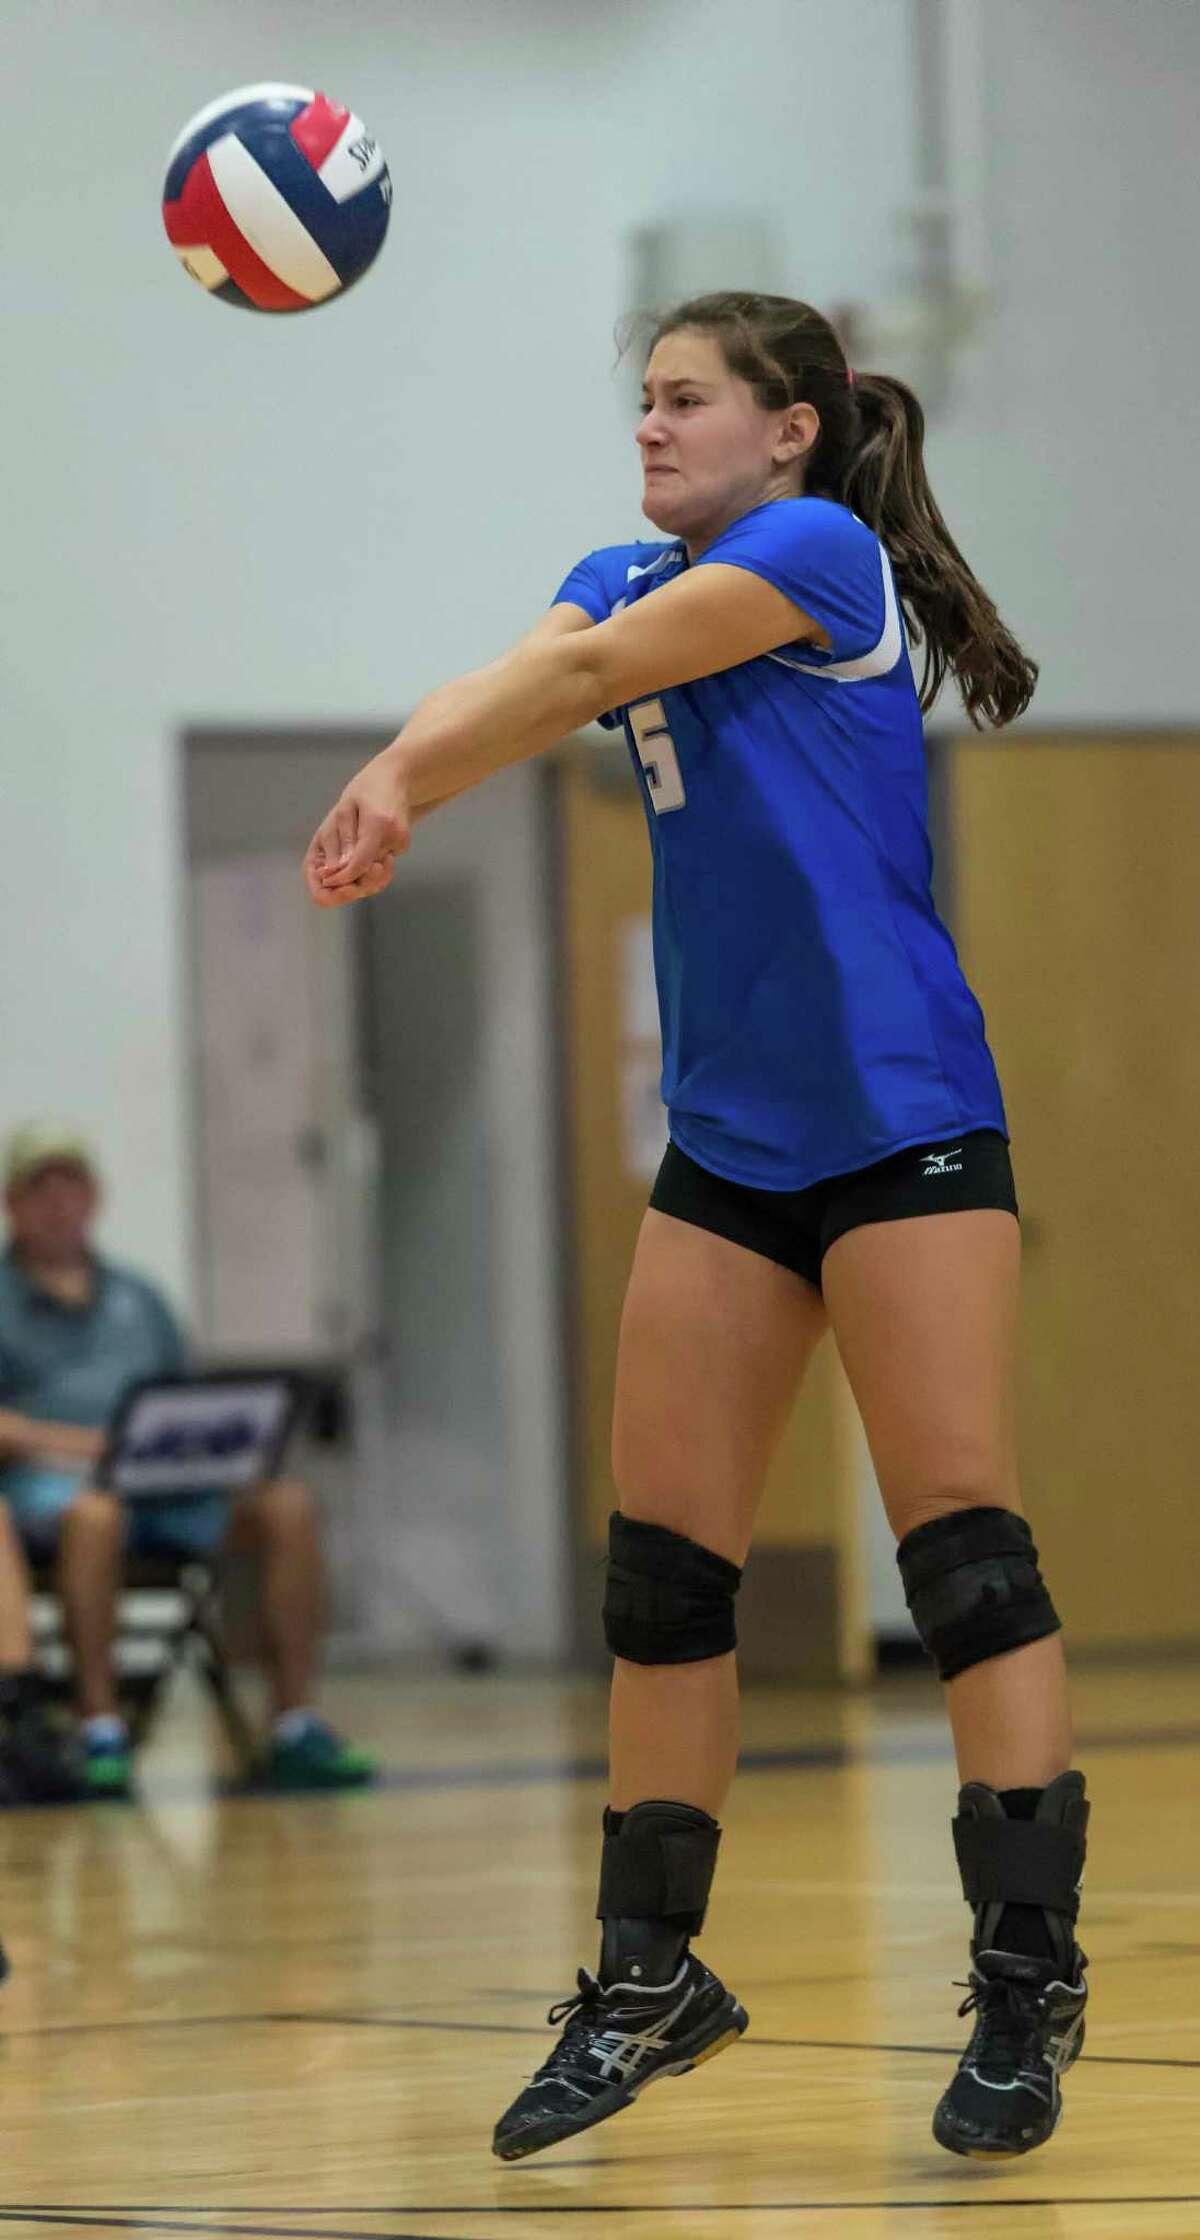 Darien High Schools Anna Barsanti returns a serve during an FCIAC girls volleyball tournament match against Staples High School played at Darien High School, Darien, CT Tuesday, November 3, 2015.